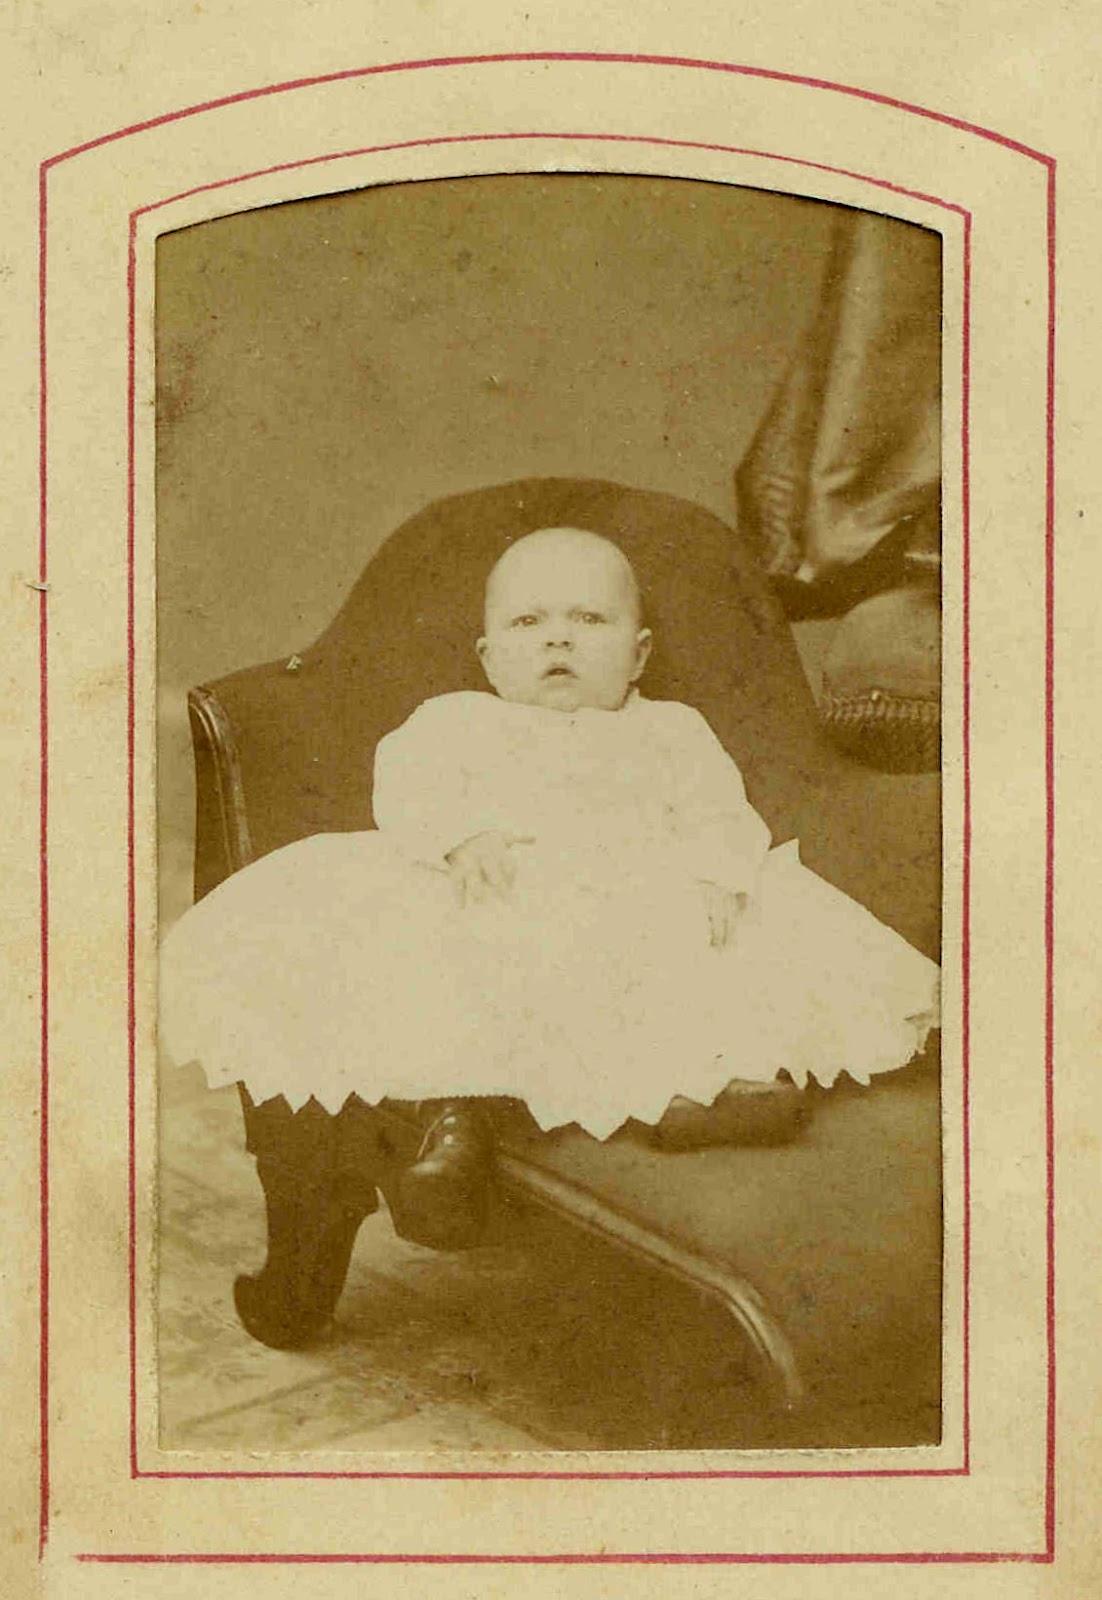 Antique Images: Victorian Photos of Babies: 3 Vintage ...